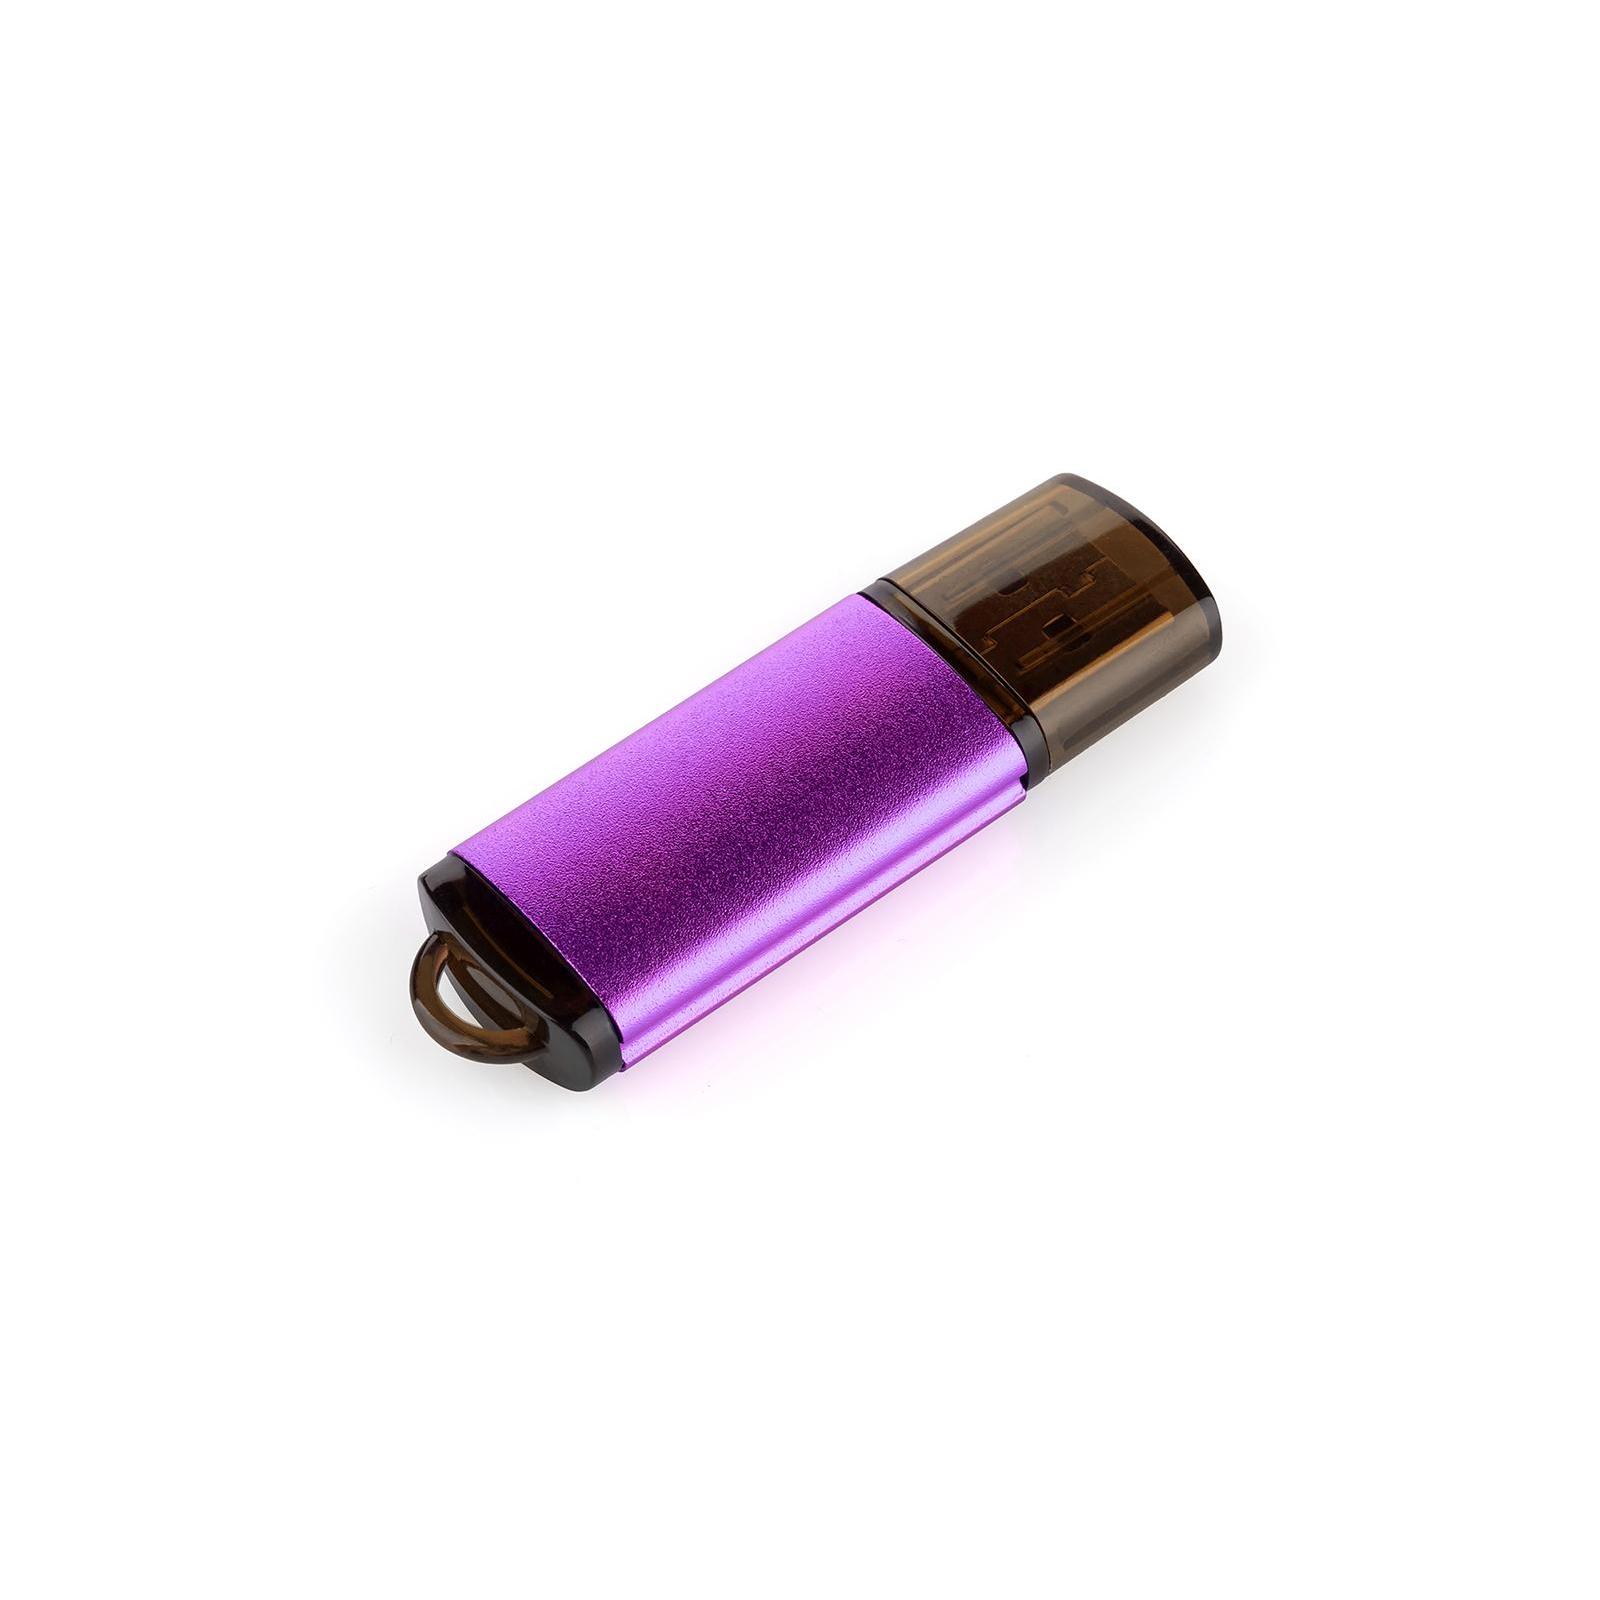 USB флеш накопитель eXceleram 64GB A3 Series Purple USB 2.0 (EXA3U2PU64) изображение 2